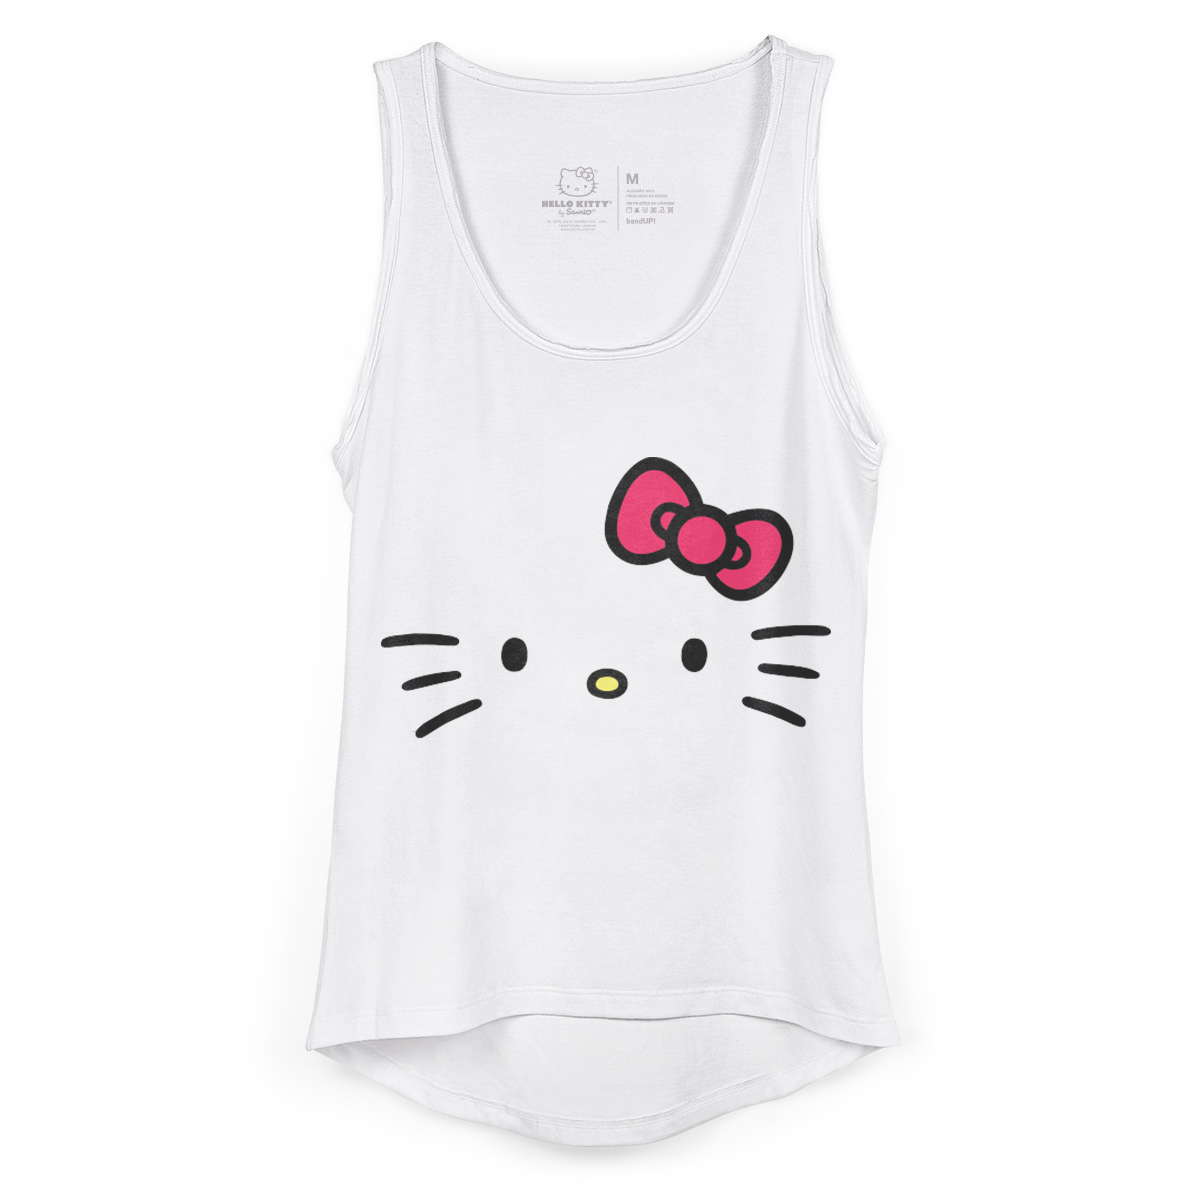 Regata Feminina Hello Kitty White